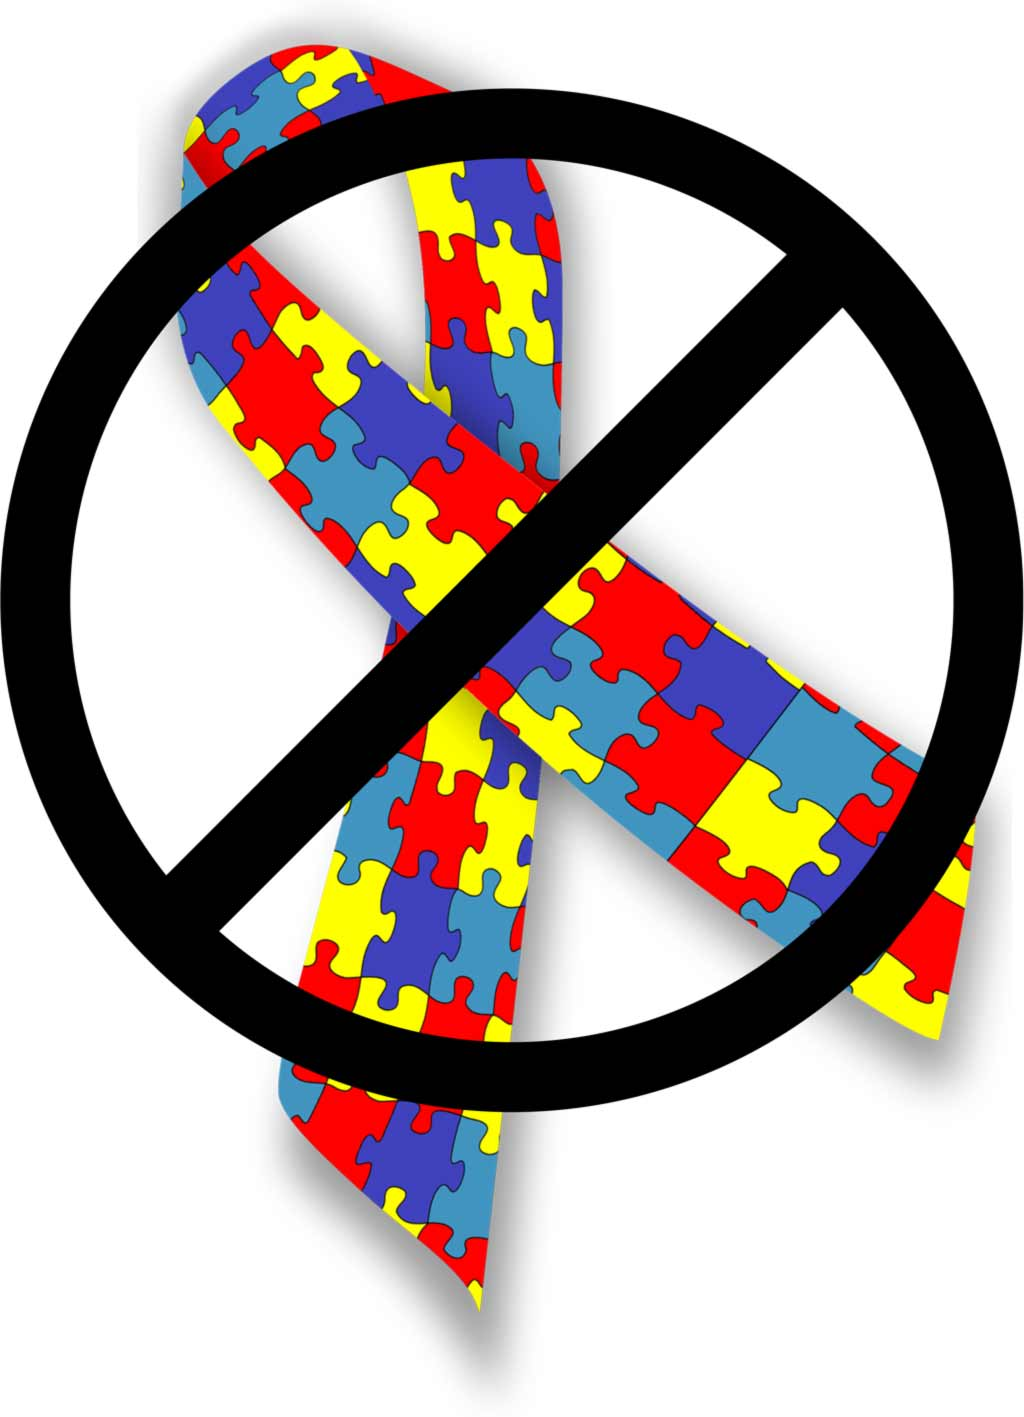 Marijuana cbd may be. Autism clipart implication